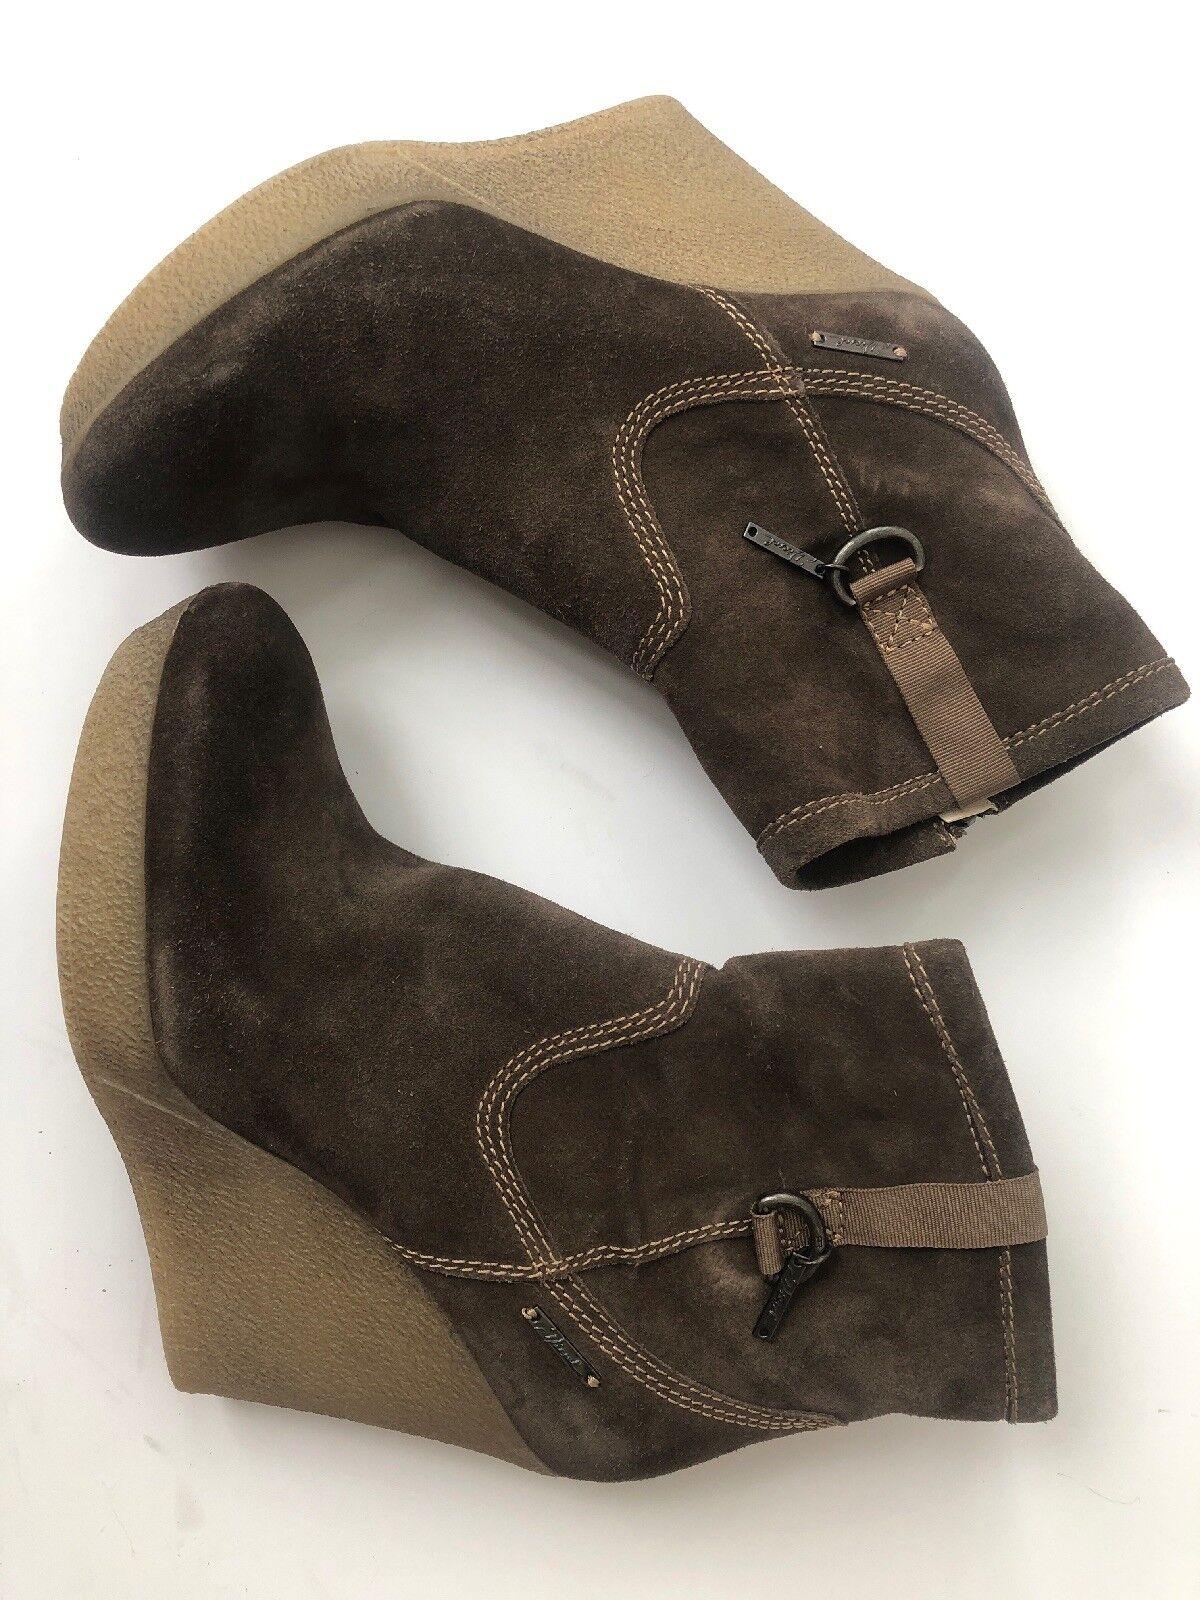 Diesel Suede Platform Leather Wedge Zipper Ankle Boots Women's Size EU 40